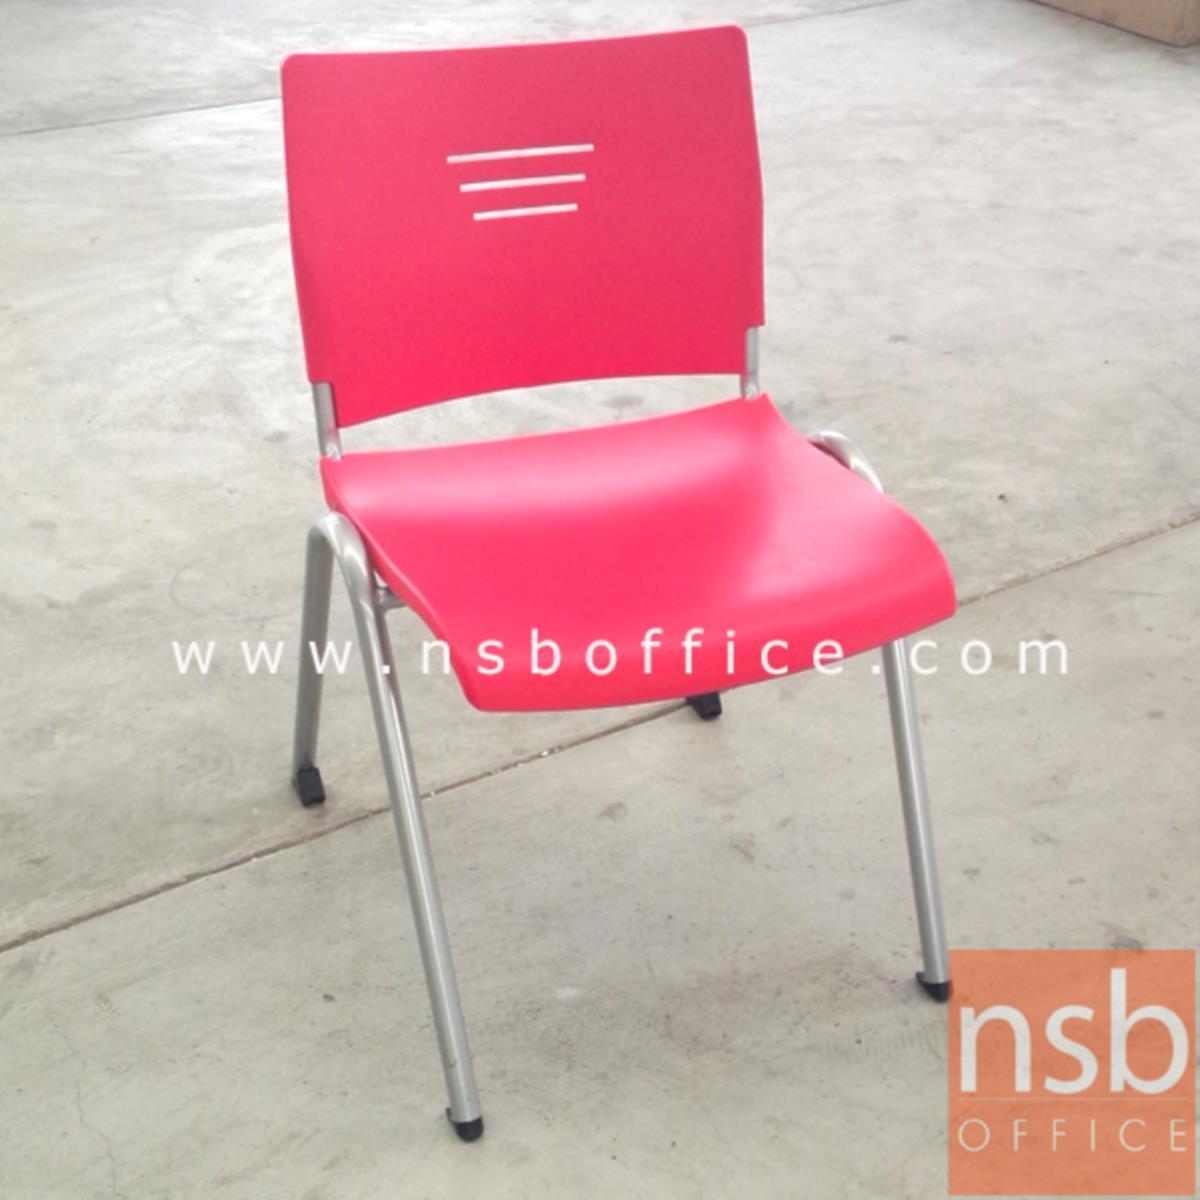 B05A132:เก้าอี้อเนกประสงค์เฟรมโพลี่ รุ่น Mozen (โมเซน)  ขาเหล็กพ่นสี epoxy